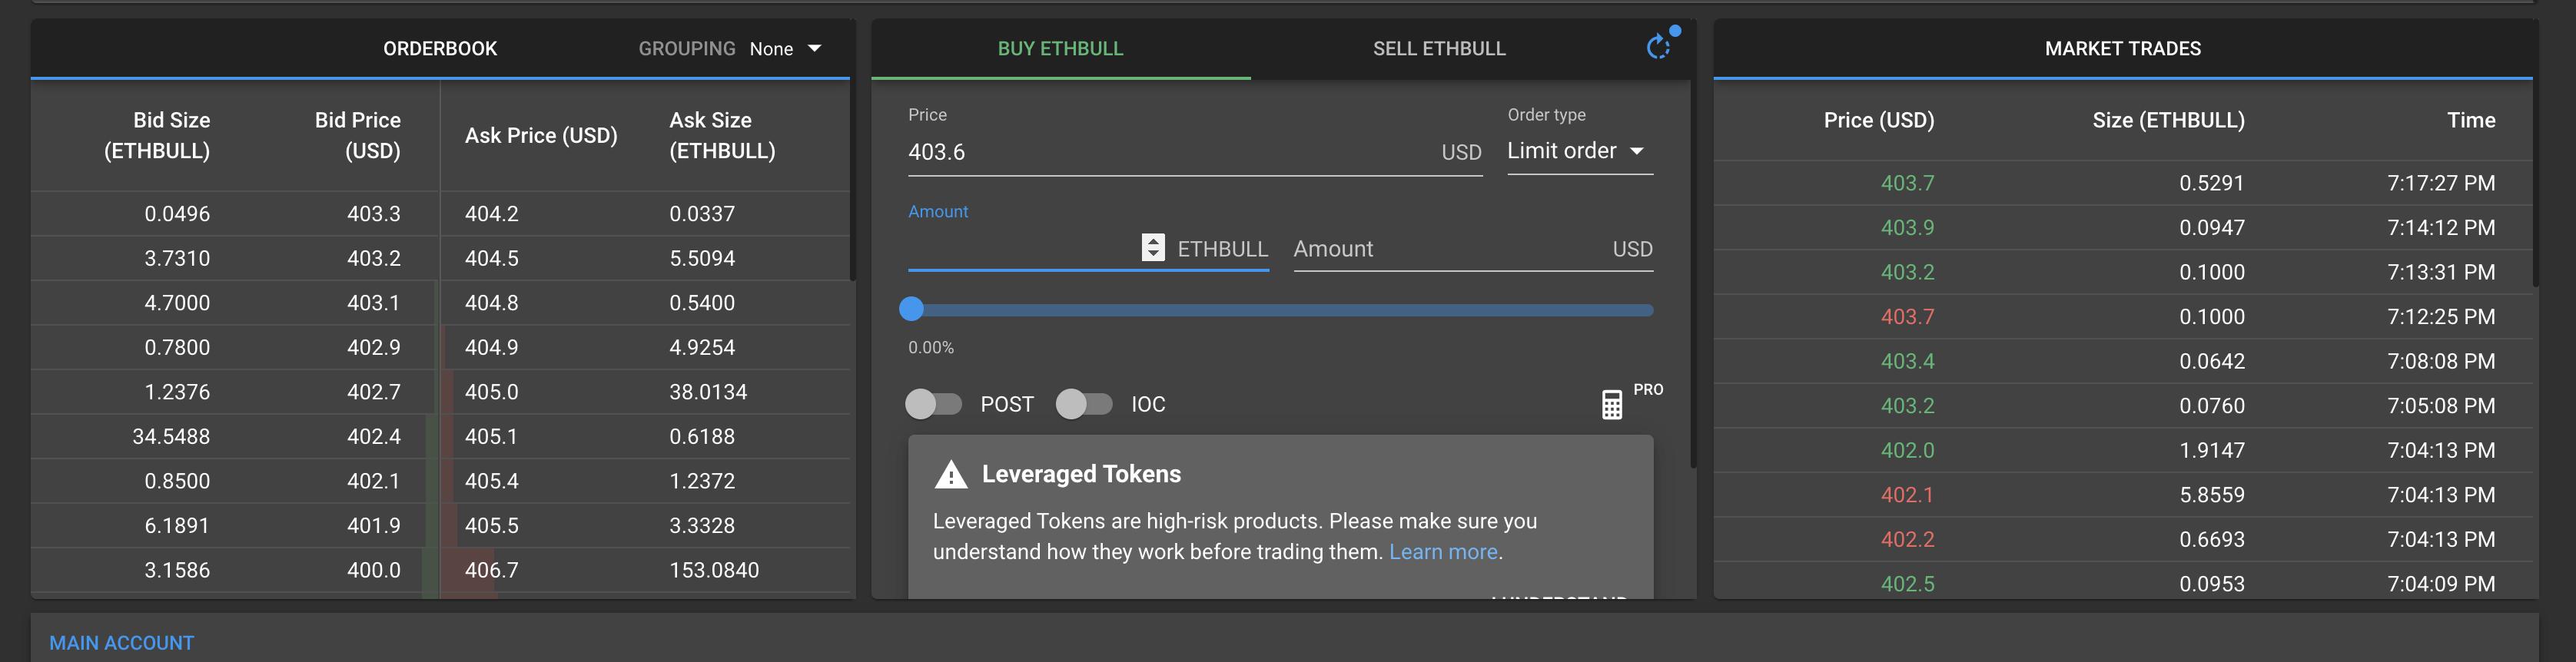 ftx-crypto-leveraged-tokens-trading-ethbull